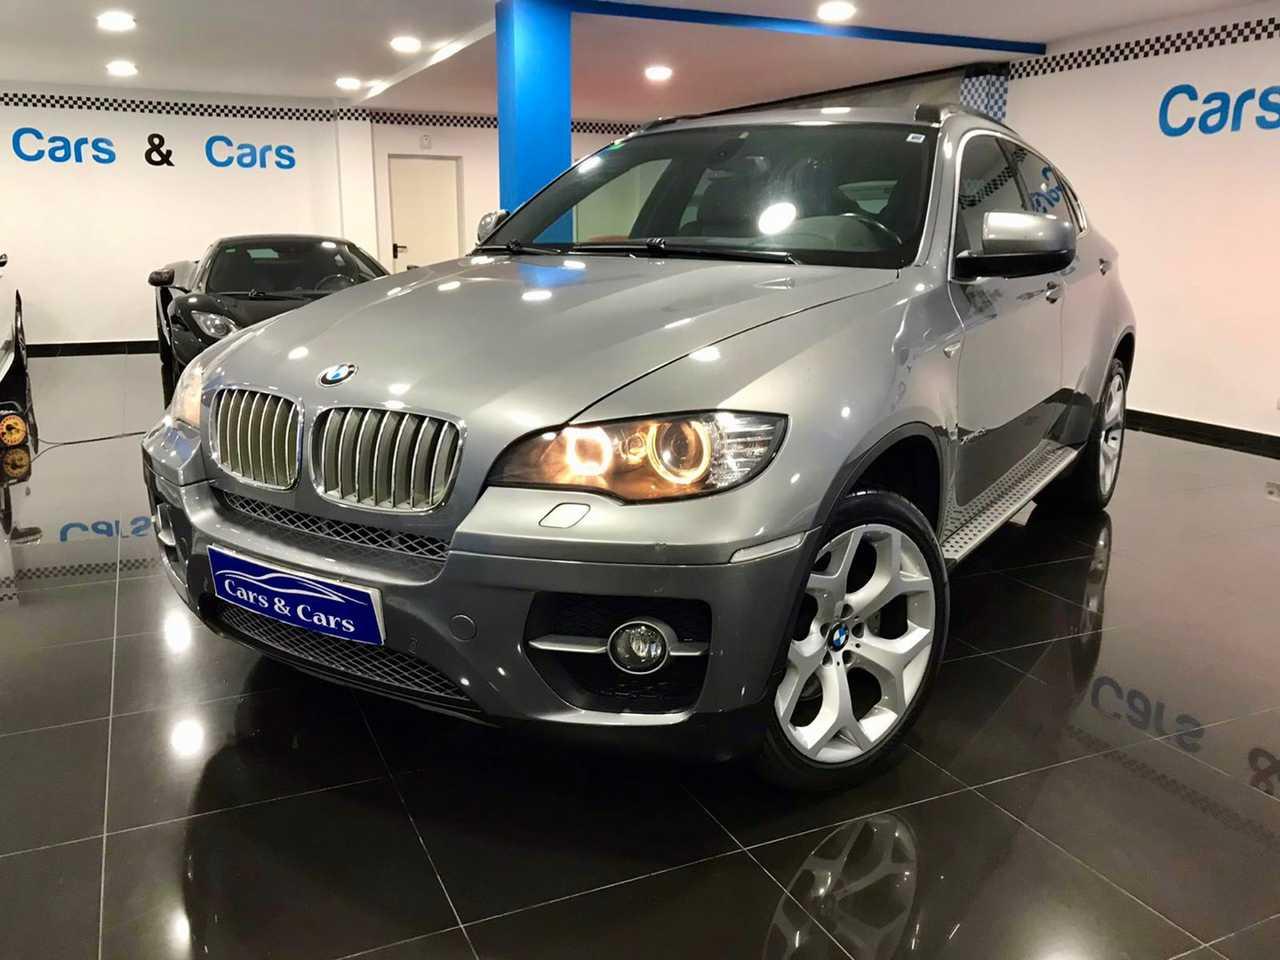 BMW X6 4.0d 5 plazas    - Foto 1